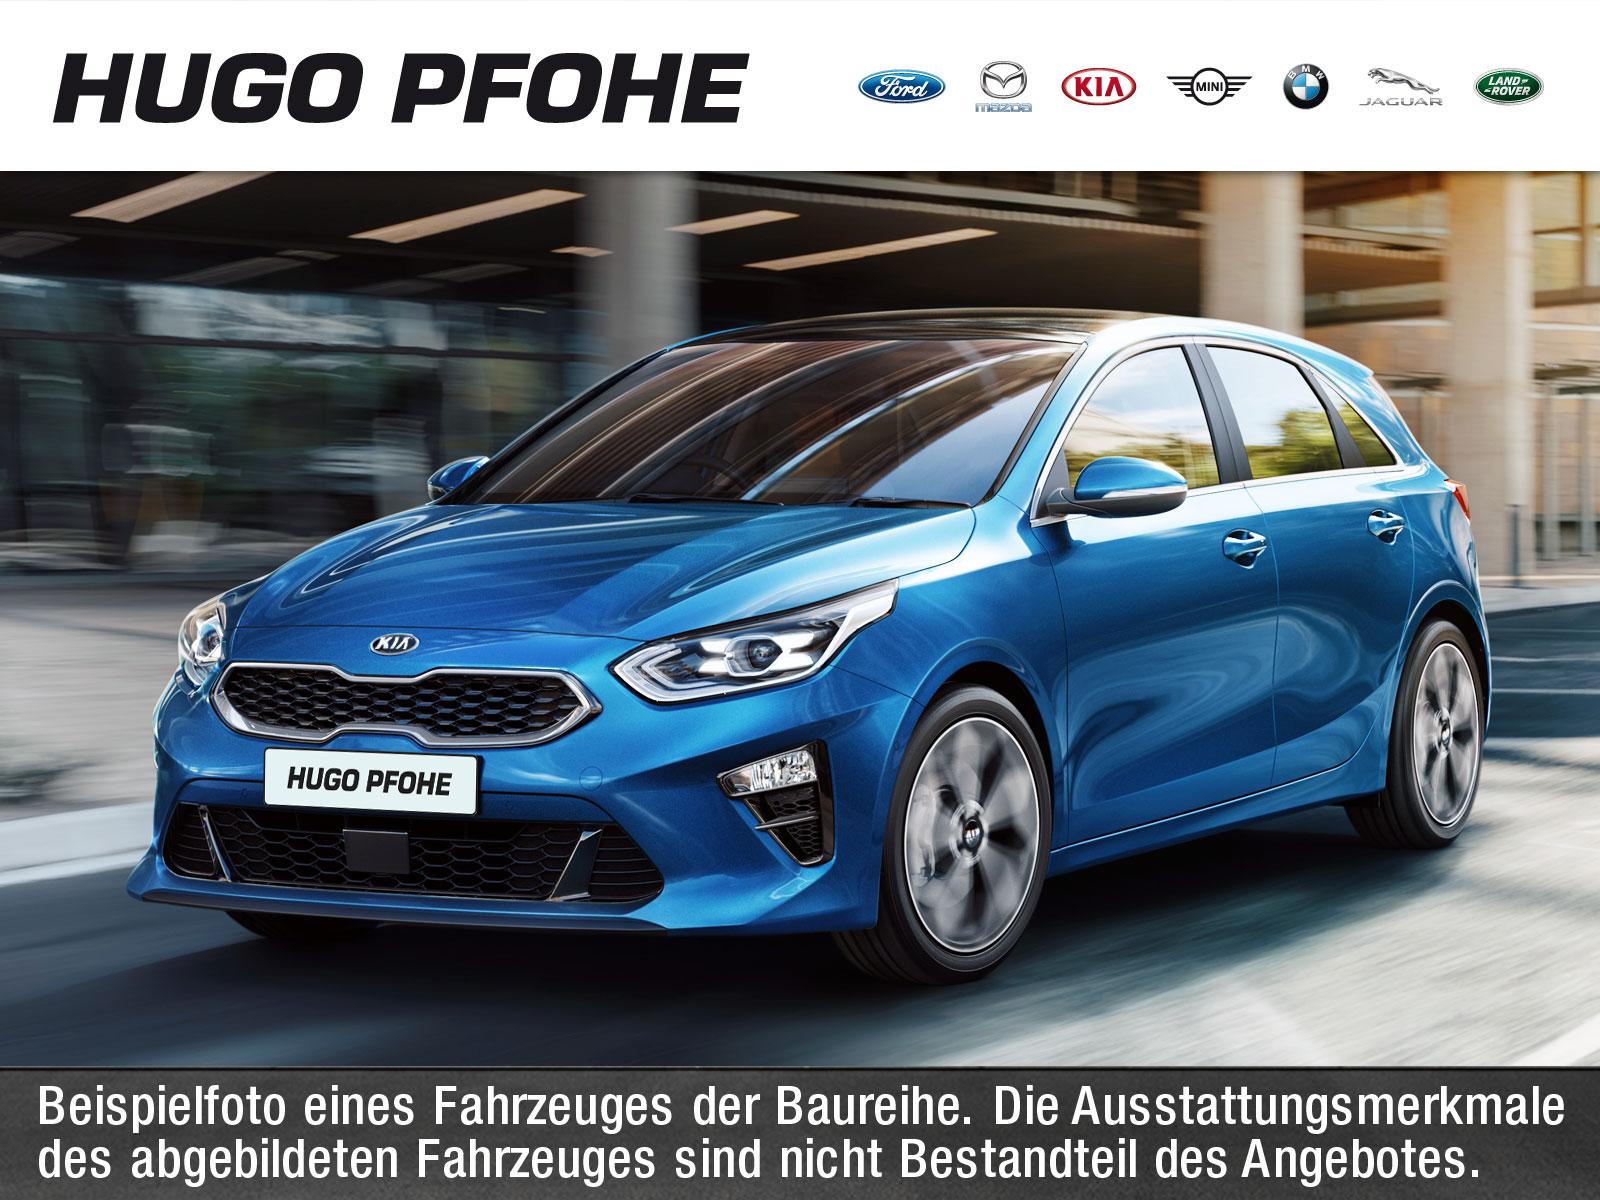 Kia cee'd Vision 1.4 T-GDI 103 kW. 5-türig, Jahr 2020, Benzin